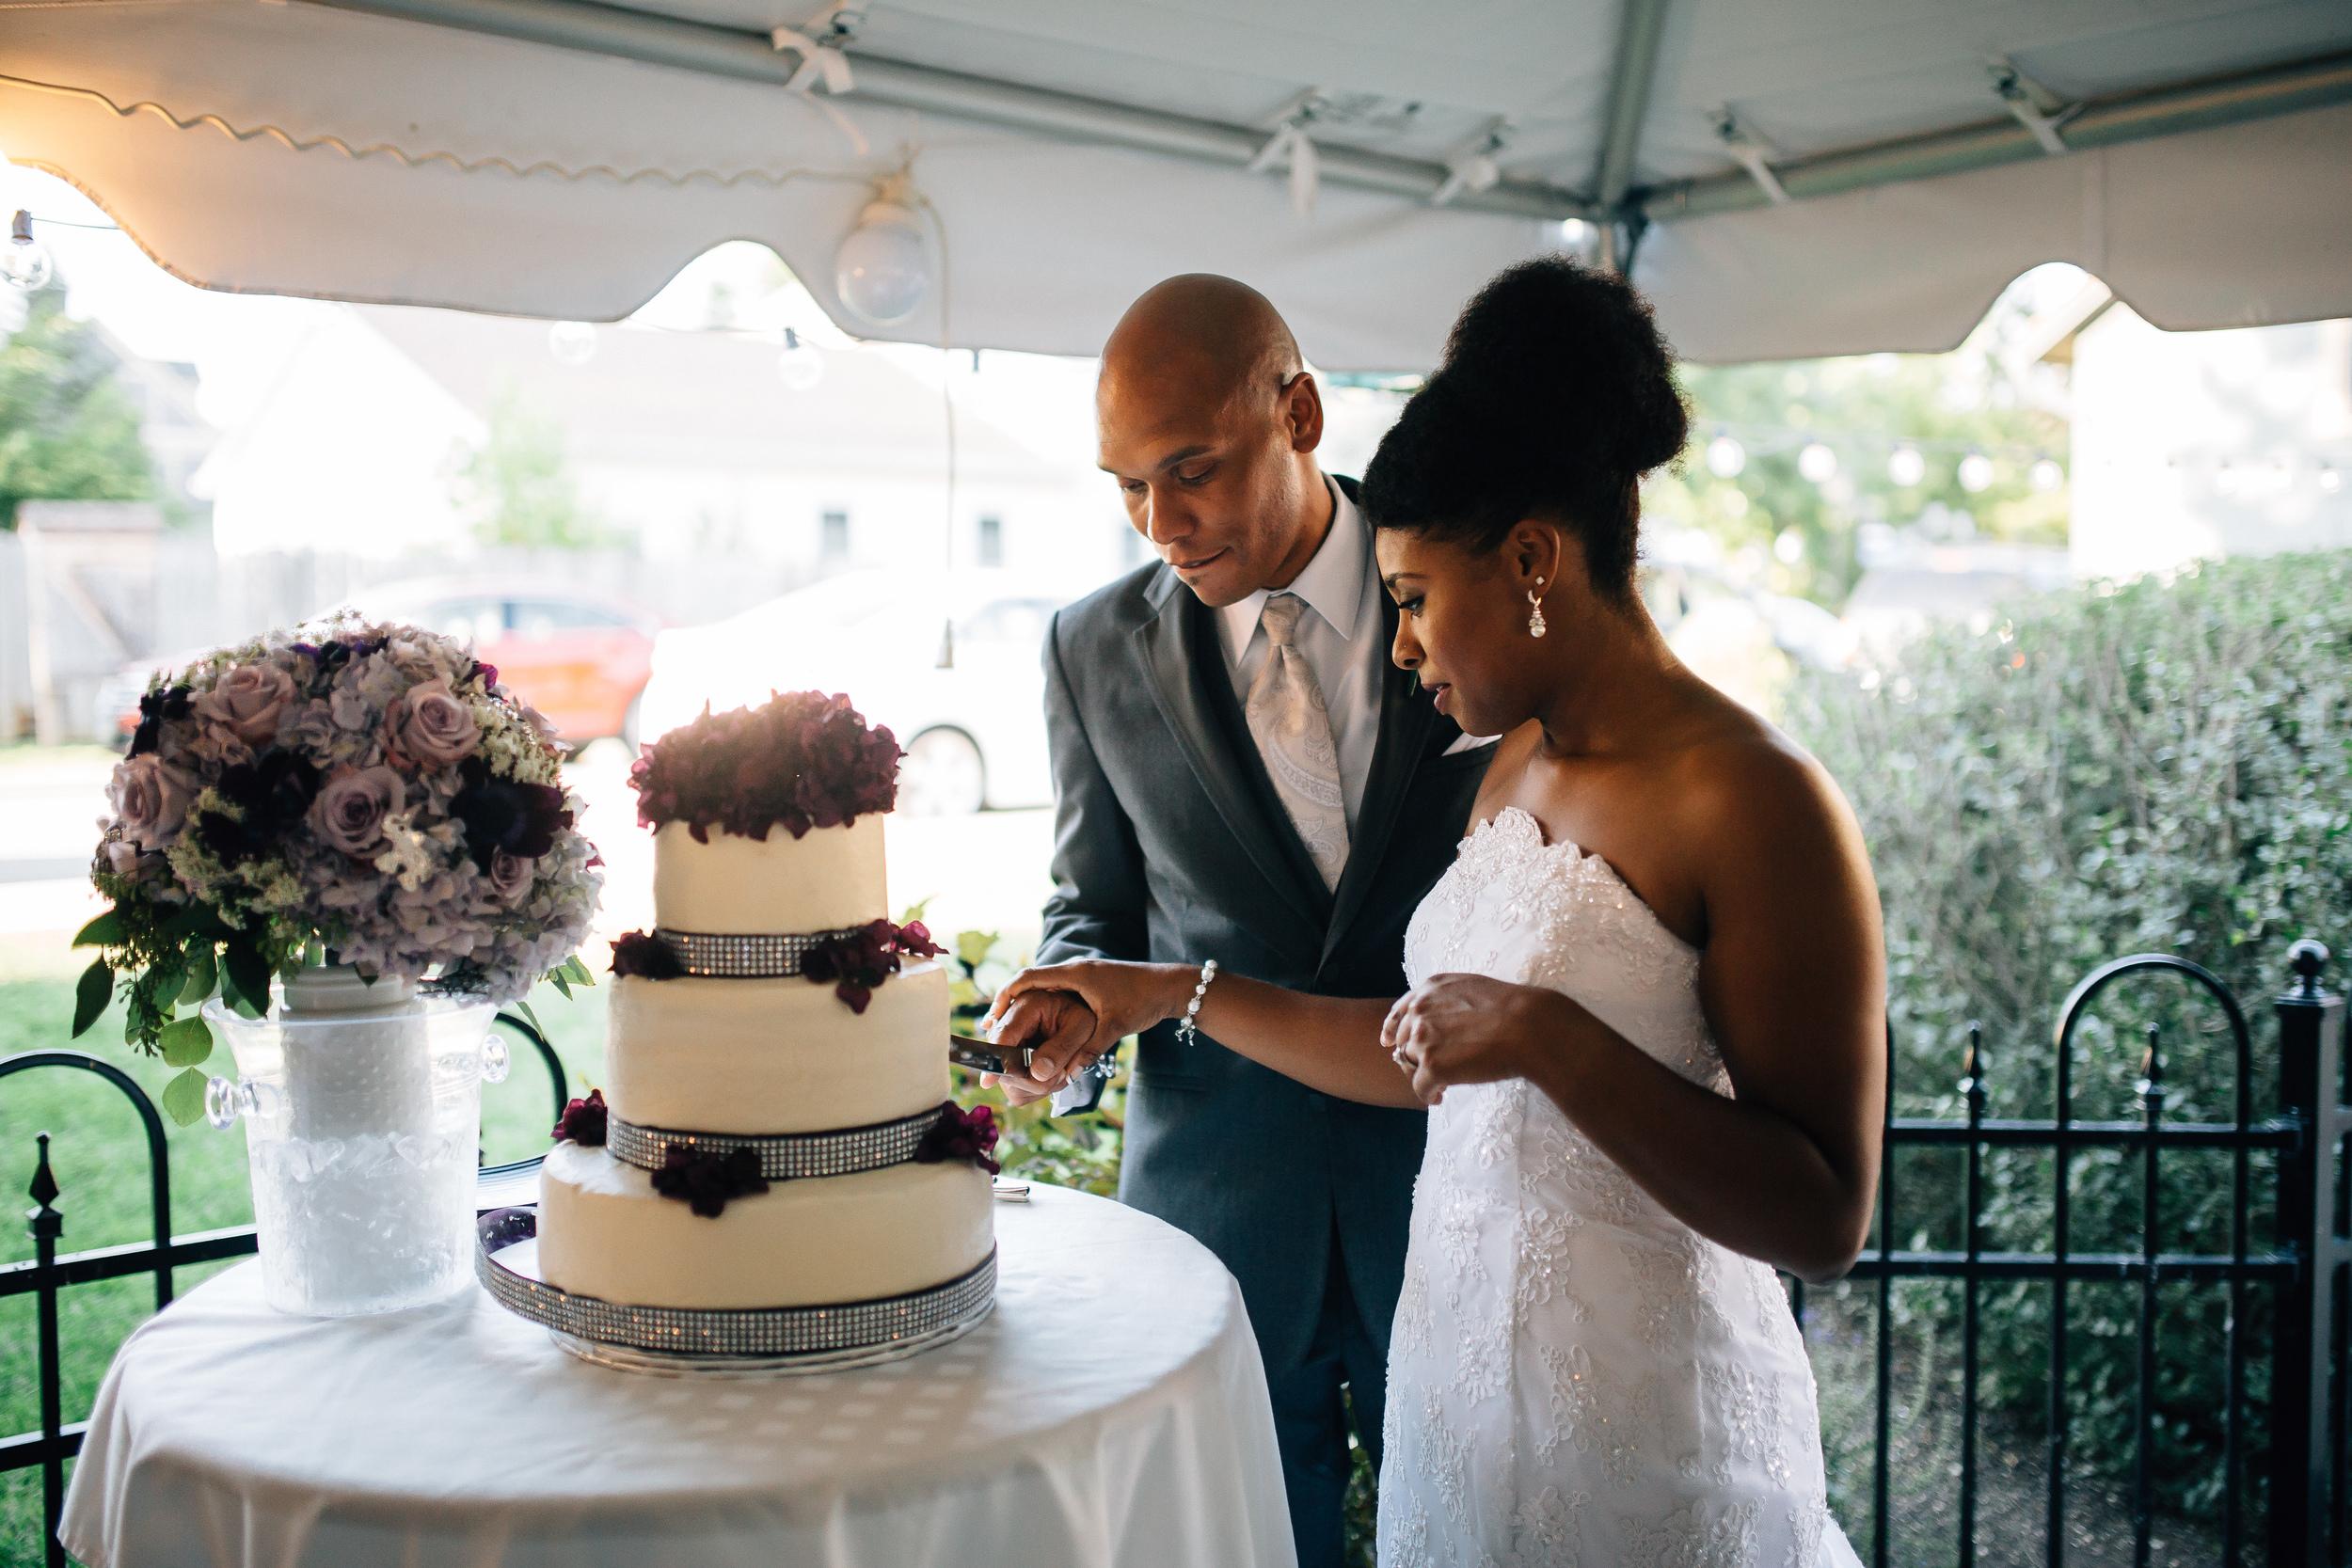 Chuck & Alicia's Wedding - Corrie Mick Photography-533.jpg